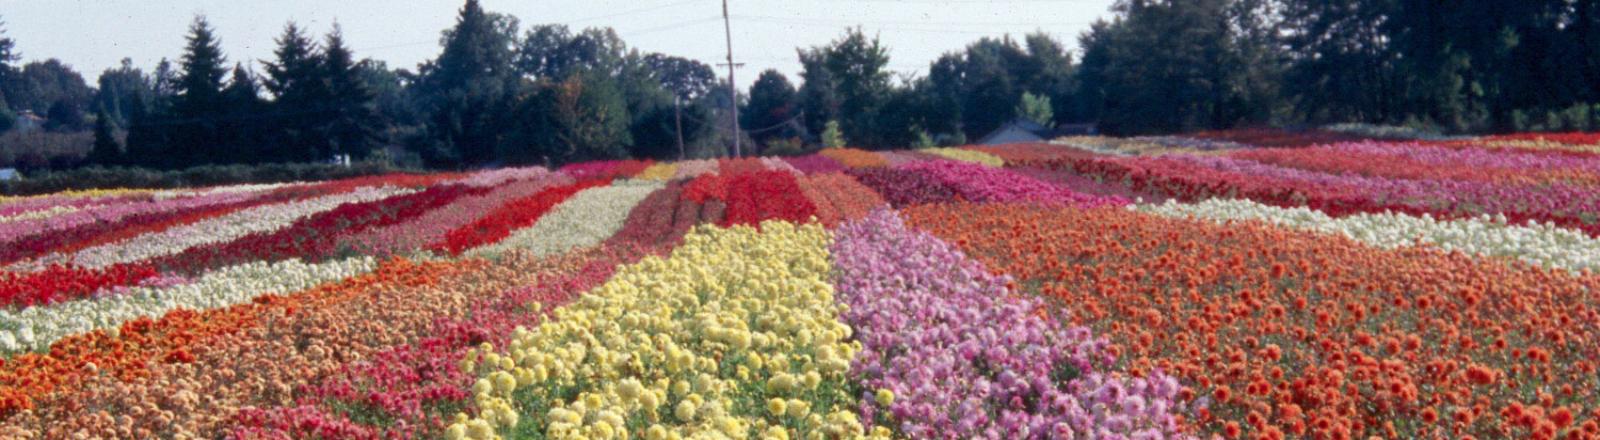 dahlias in multi colored rows